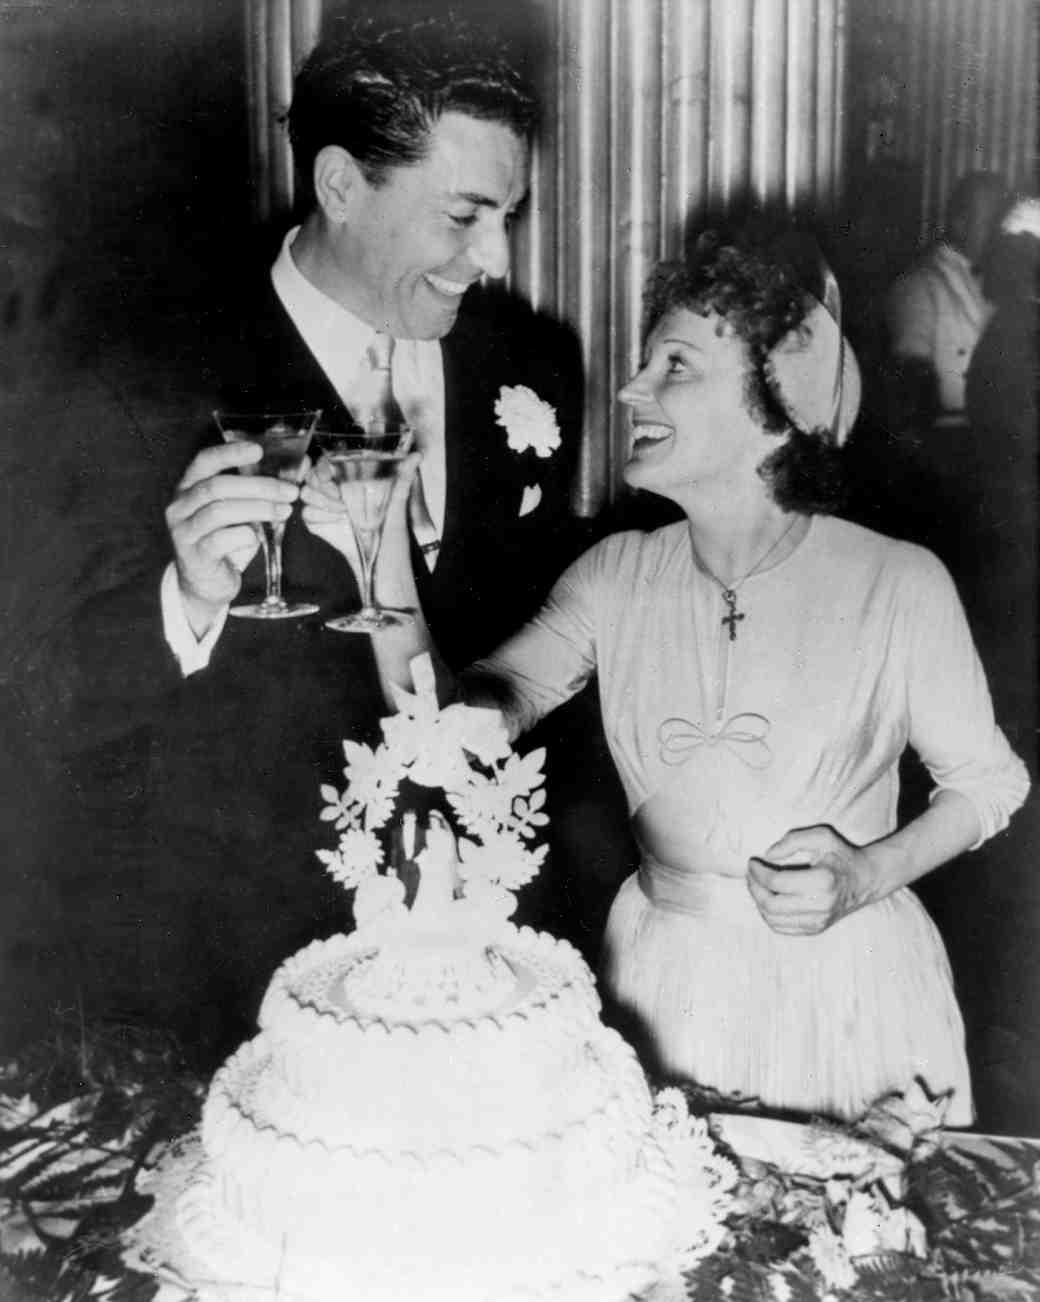 celebrity-vintage-wedding-cakes-edith-piaf-541056091-1015.jpg